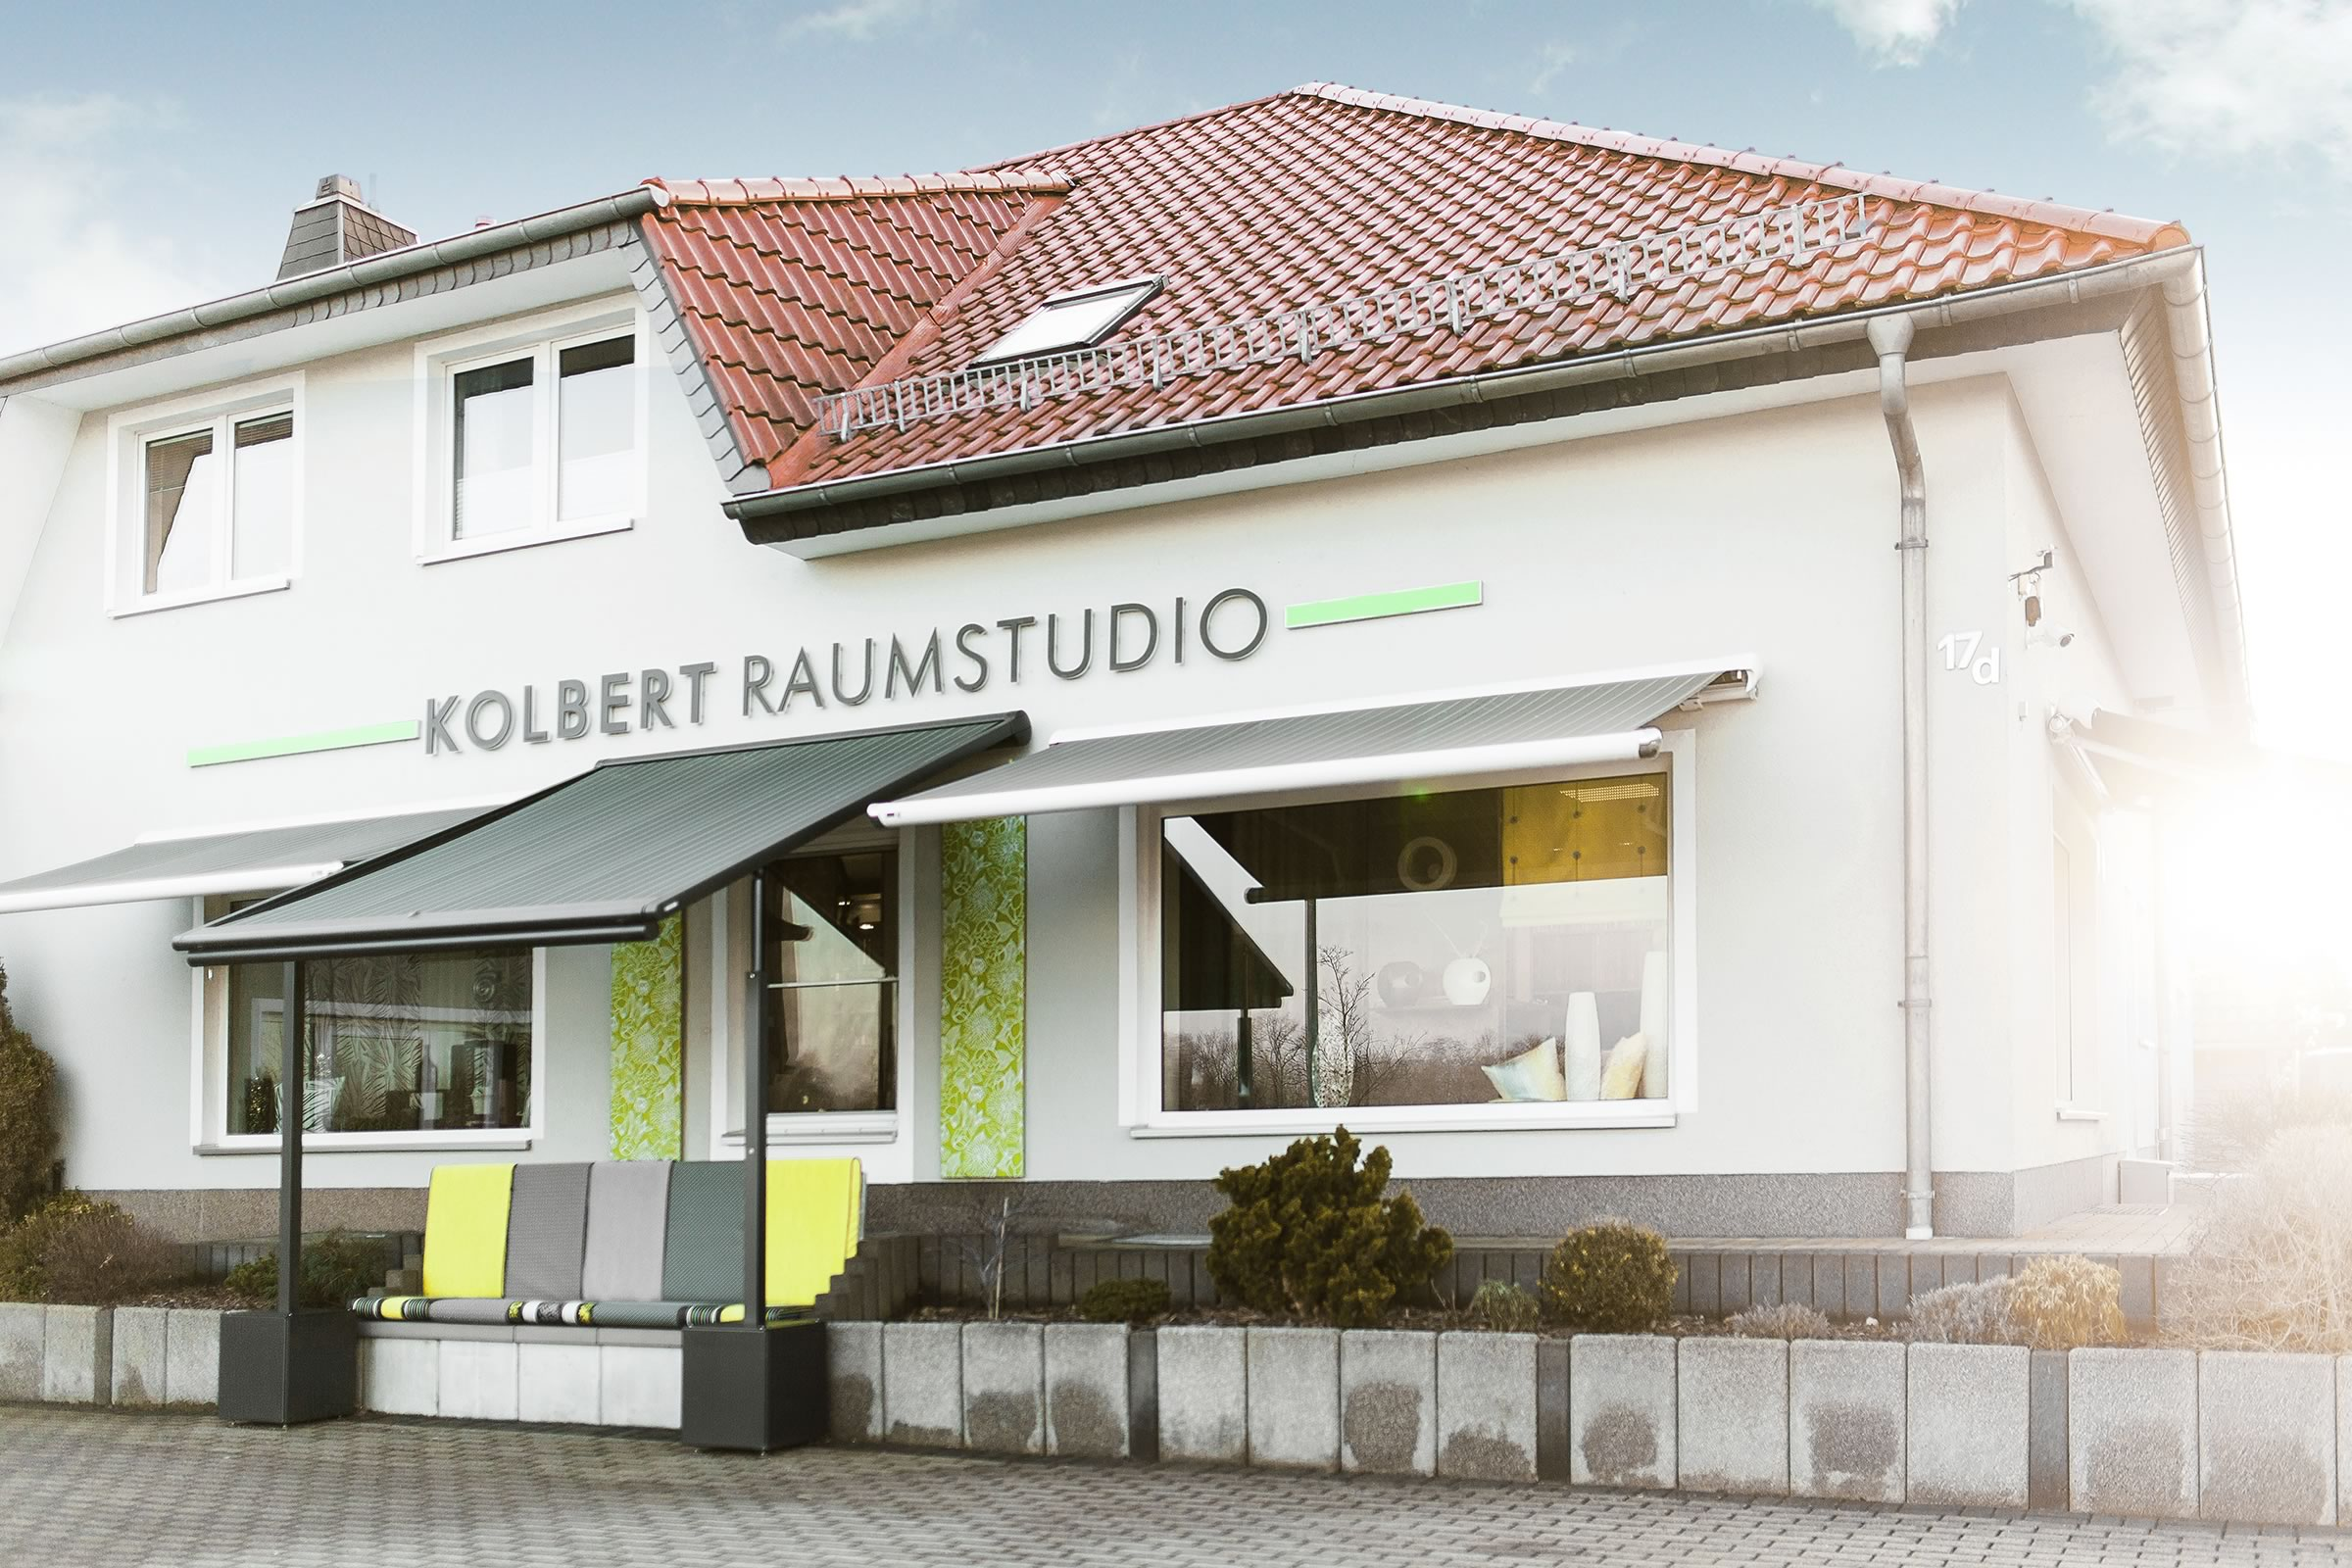 Kolbert Raumstudio